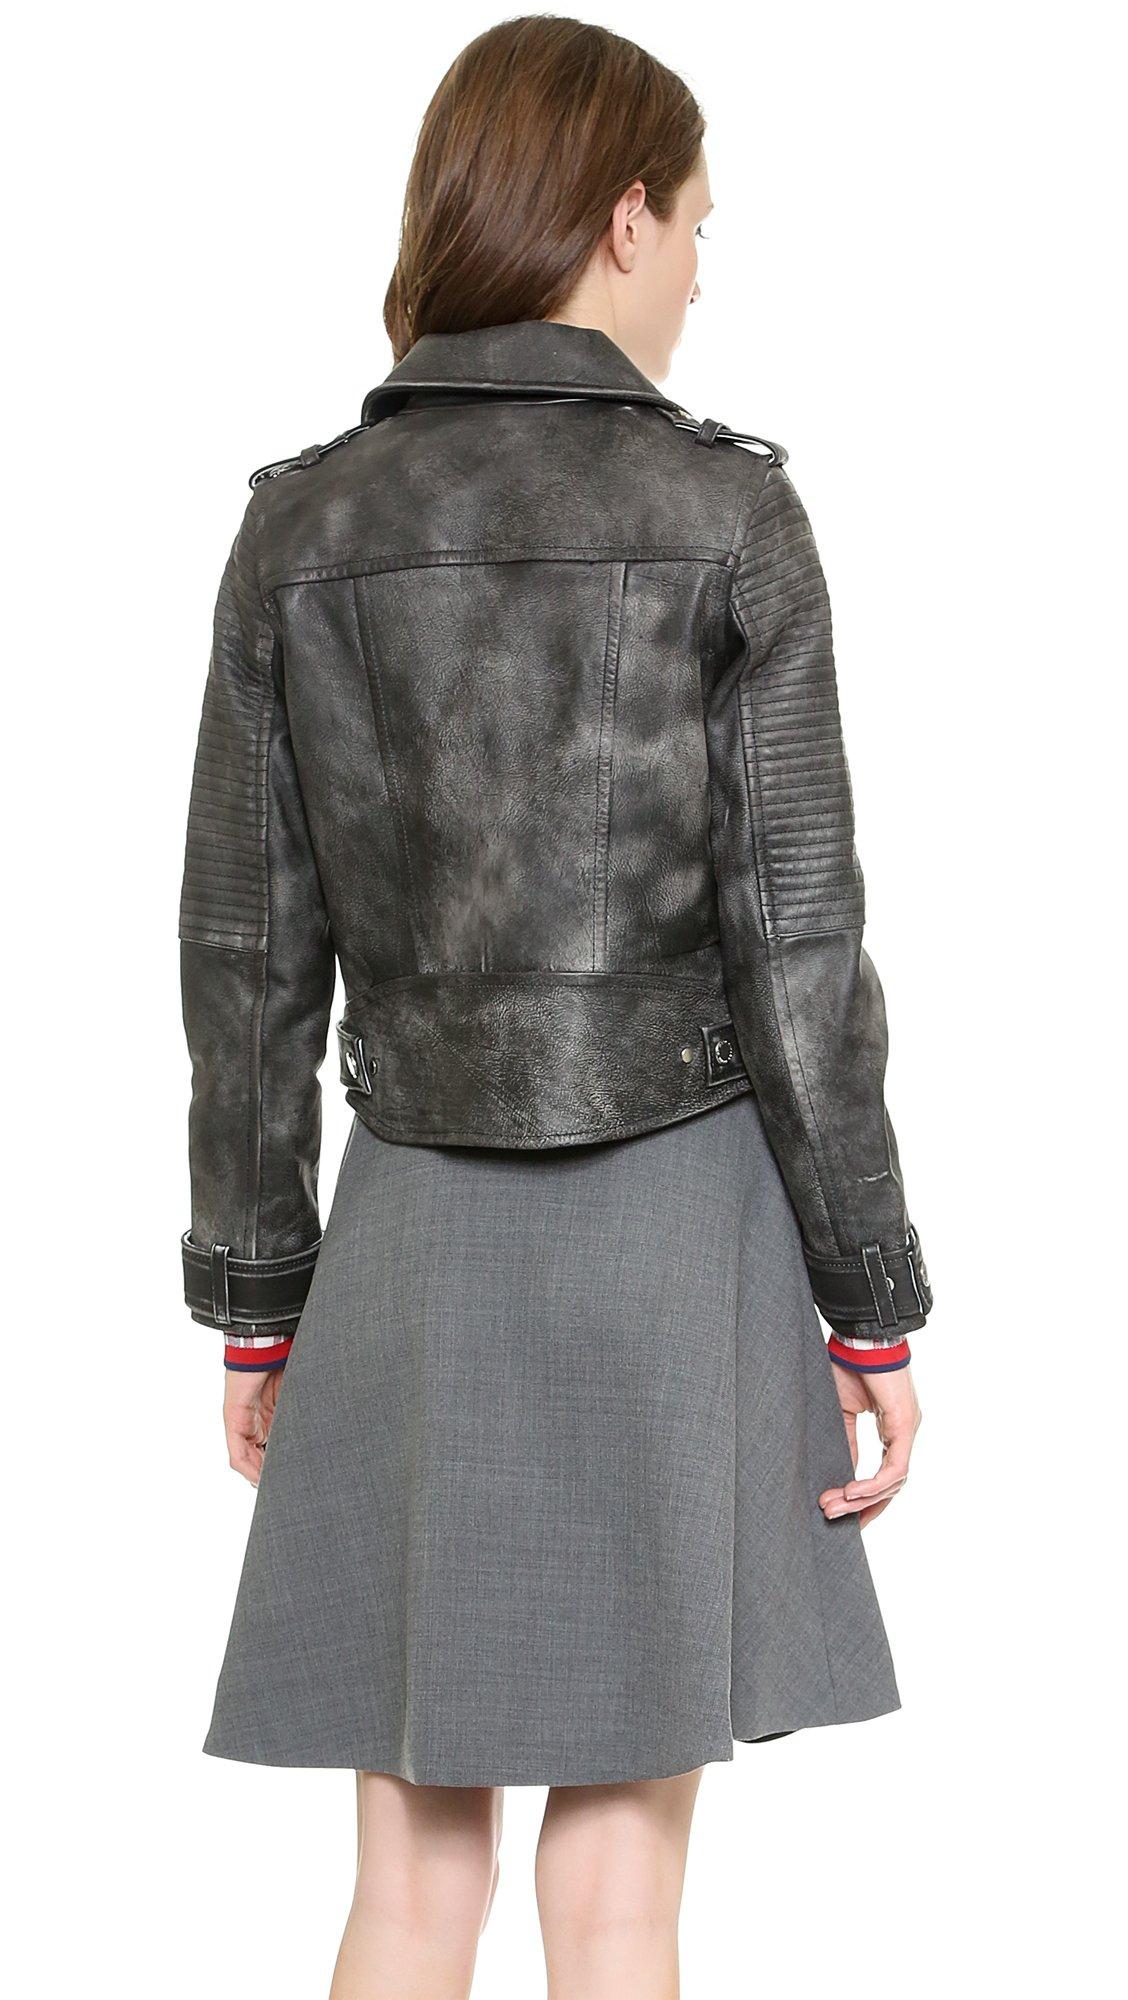 Marcs leather jacket